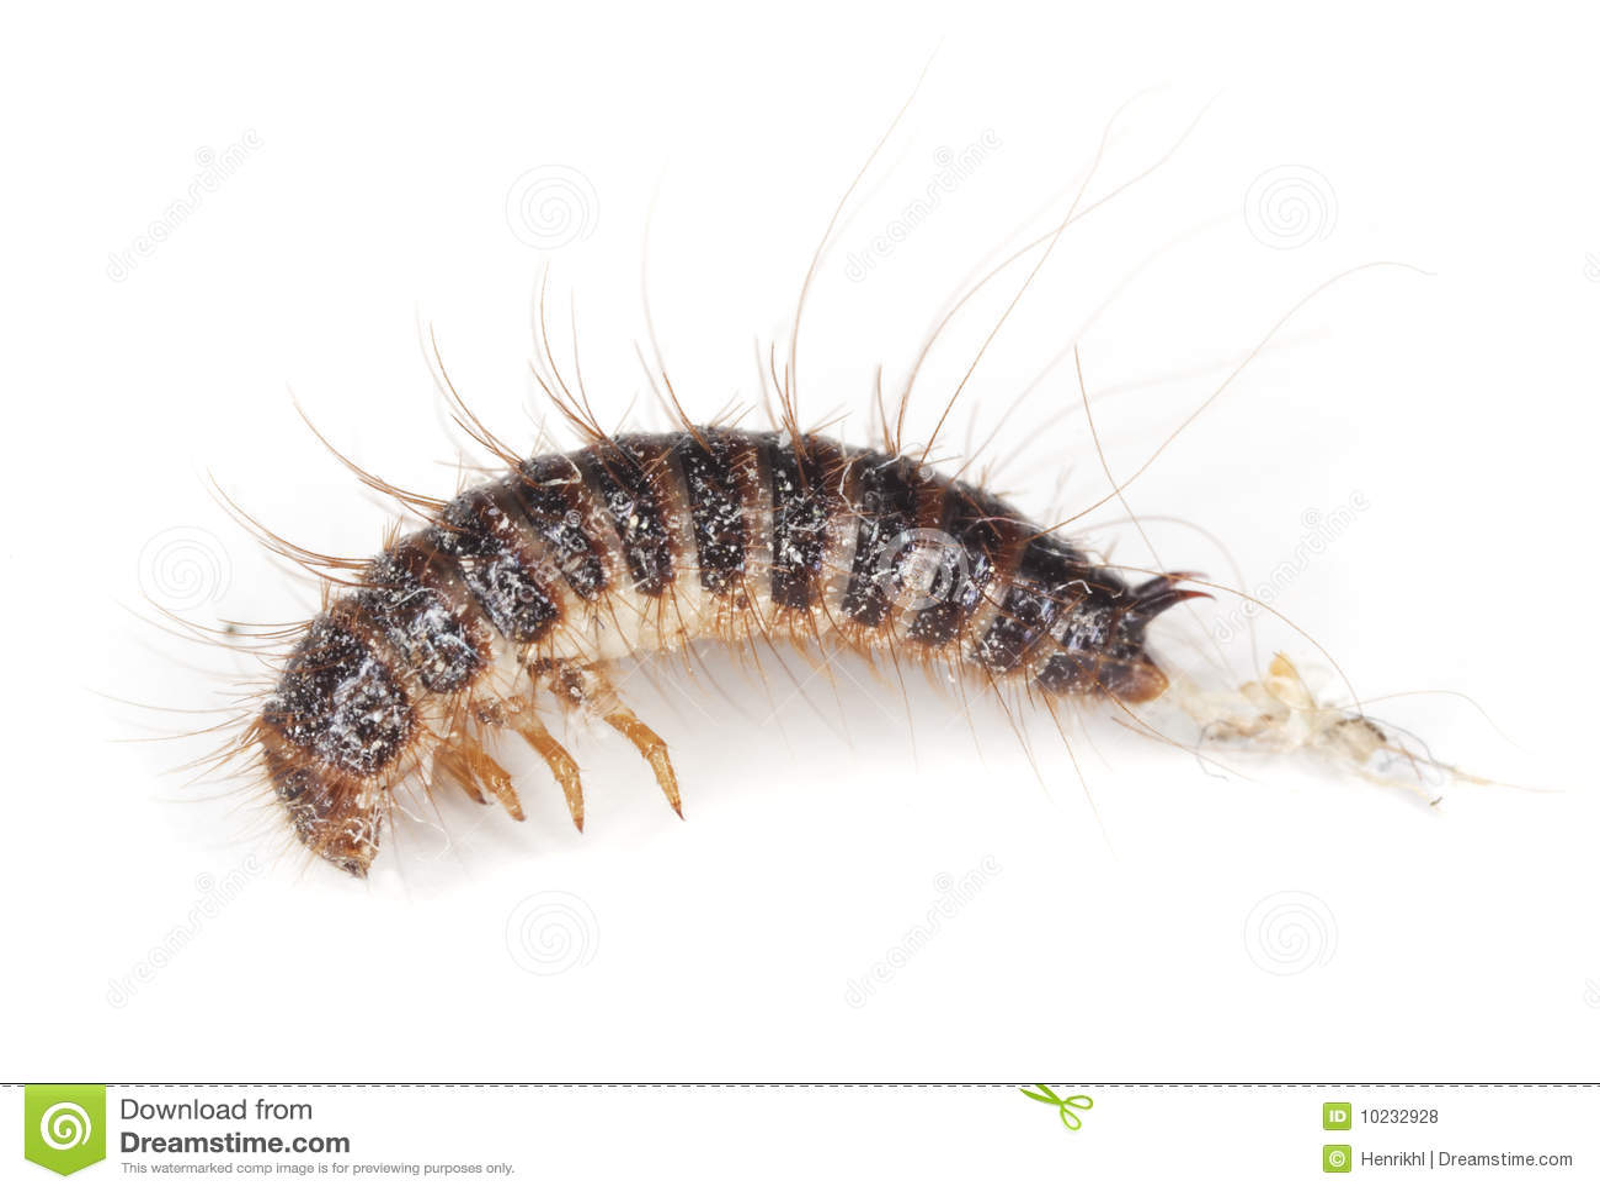 Dermestid Beetle Larvae. Royalty Free Stock Photos - Image ...